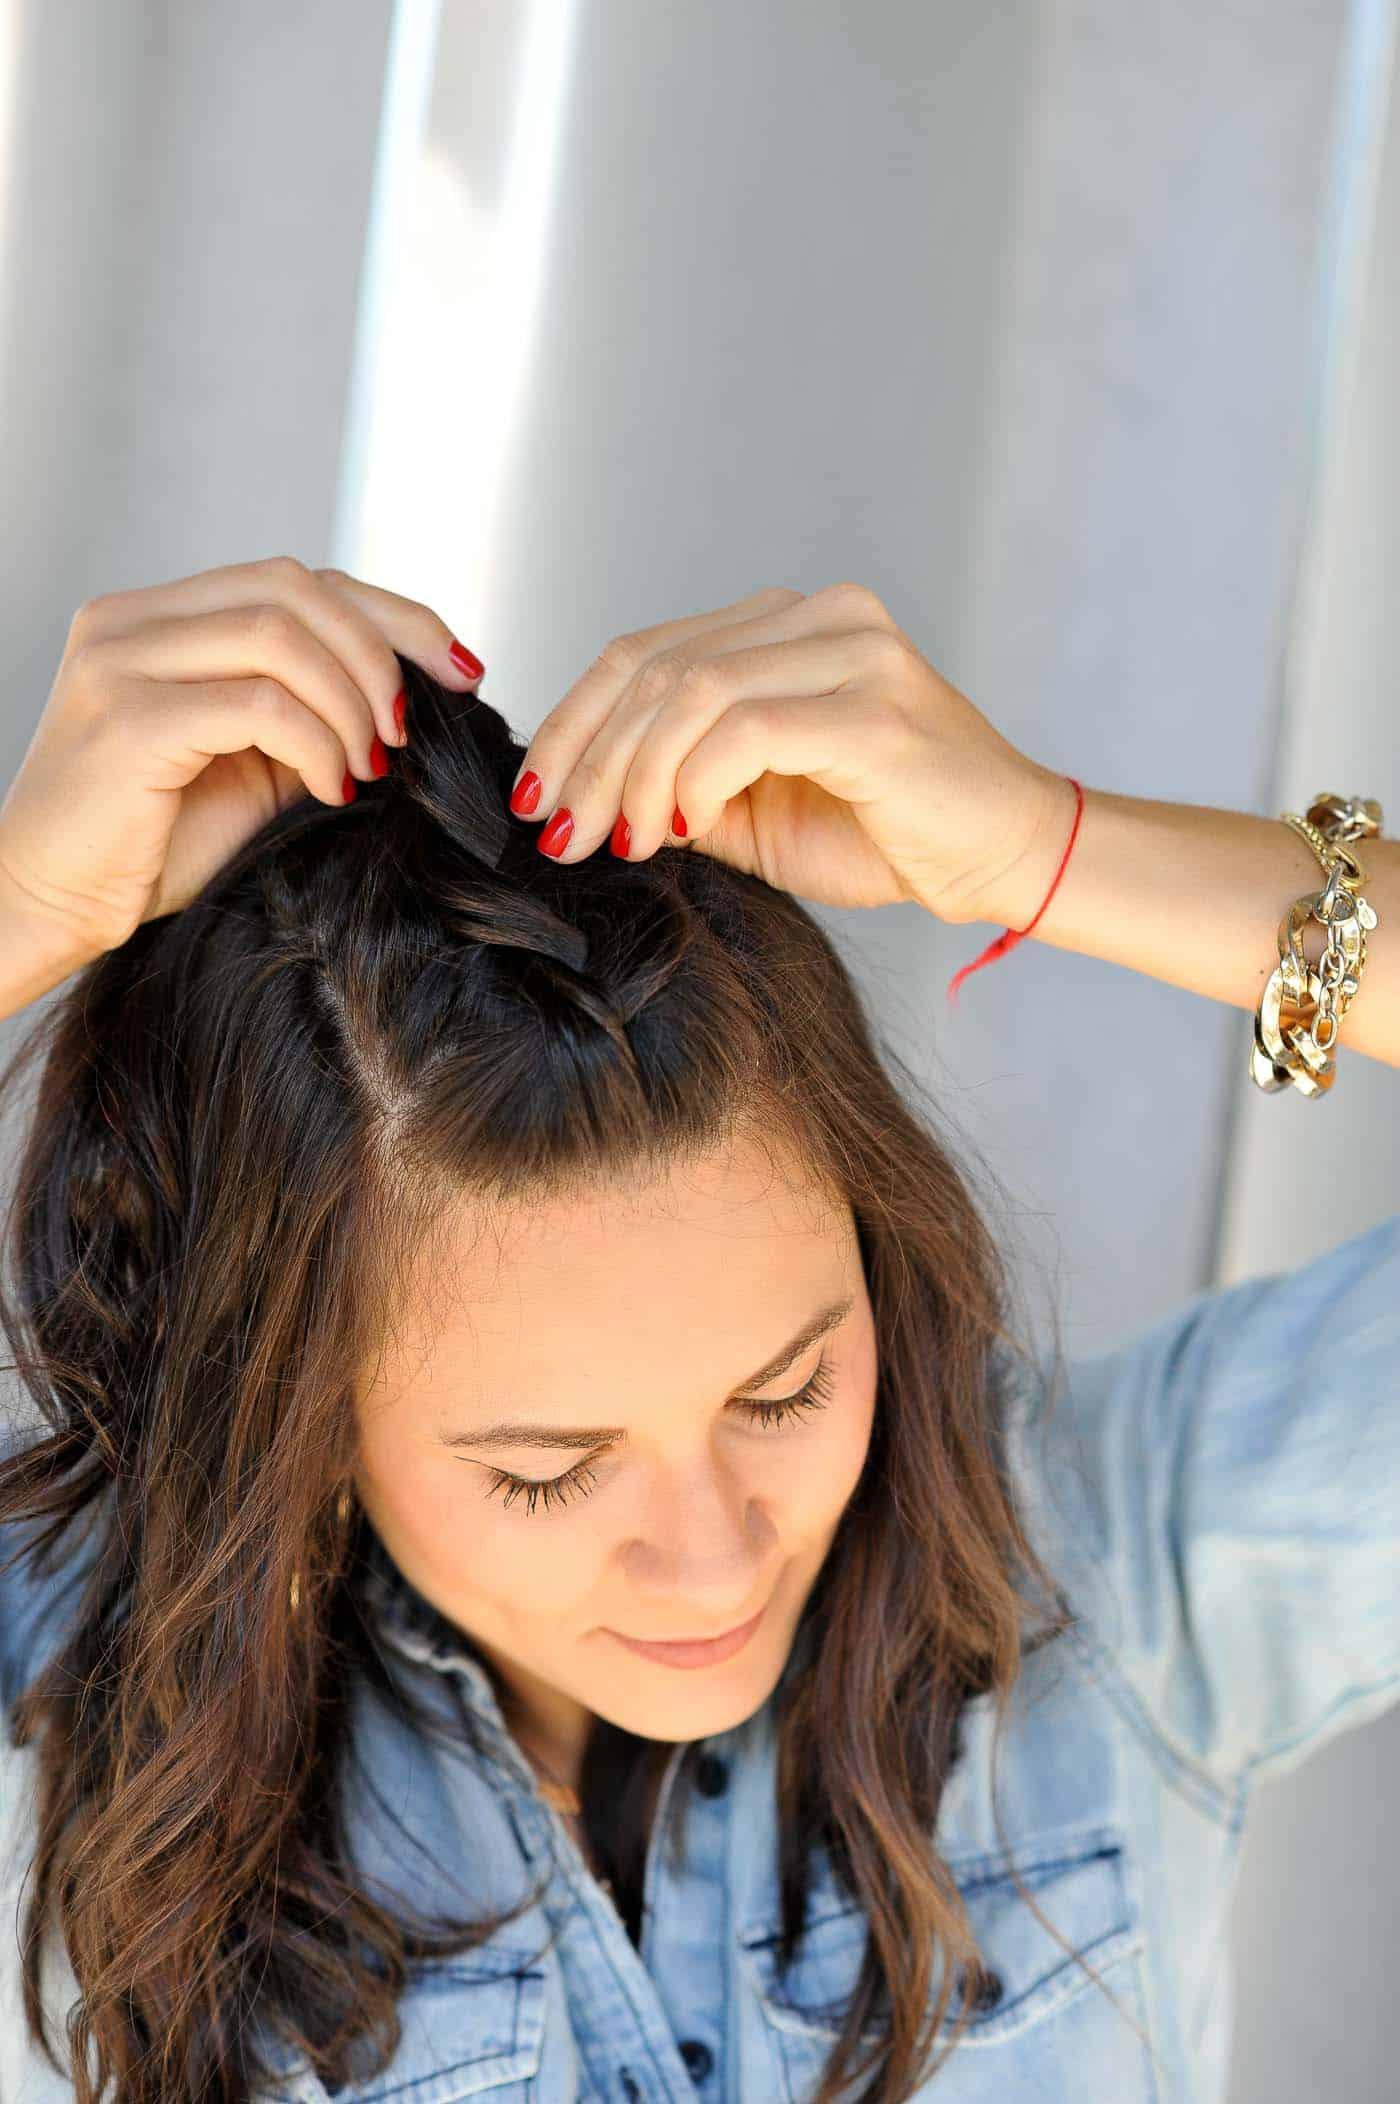 braided hairstyles for short hair, braid ideas - My Style Vita @mystylevita